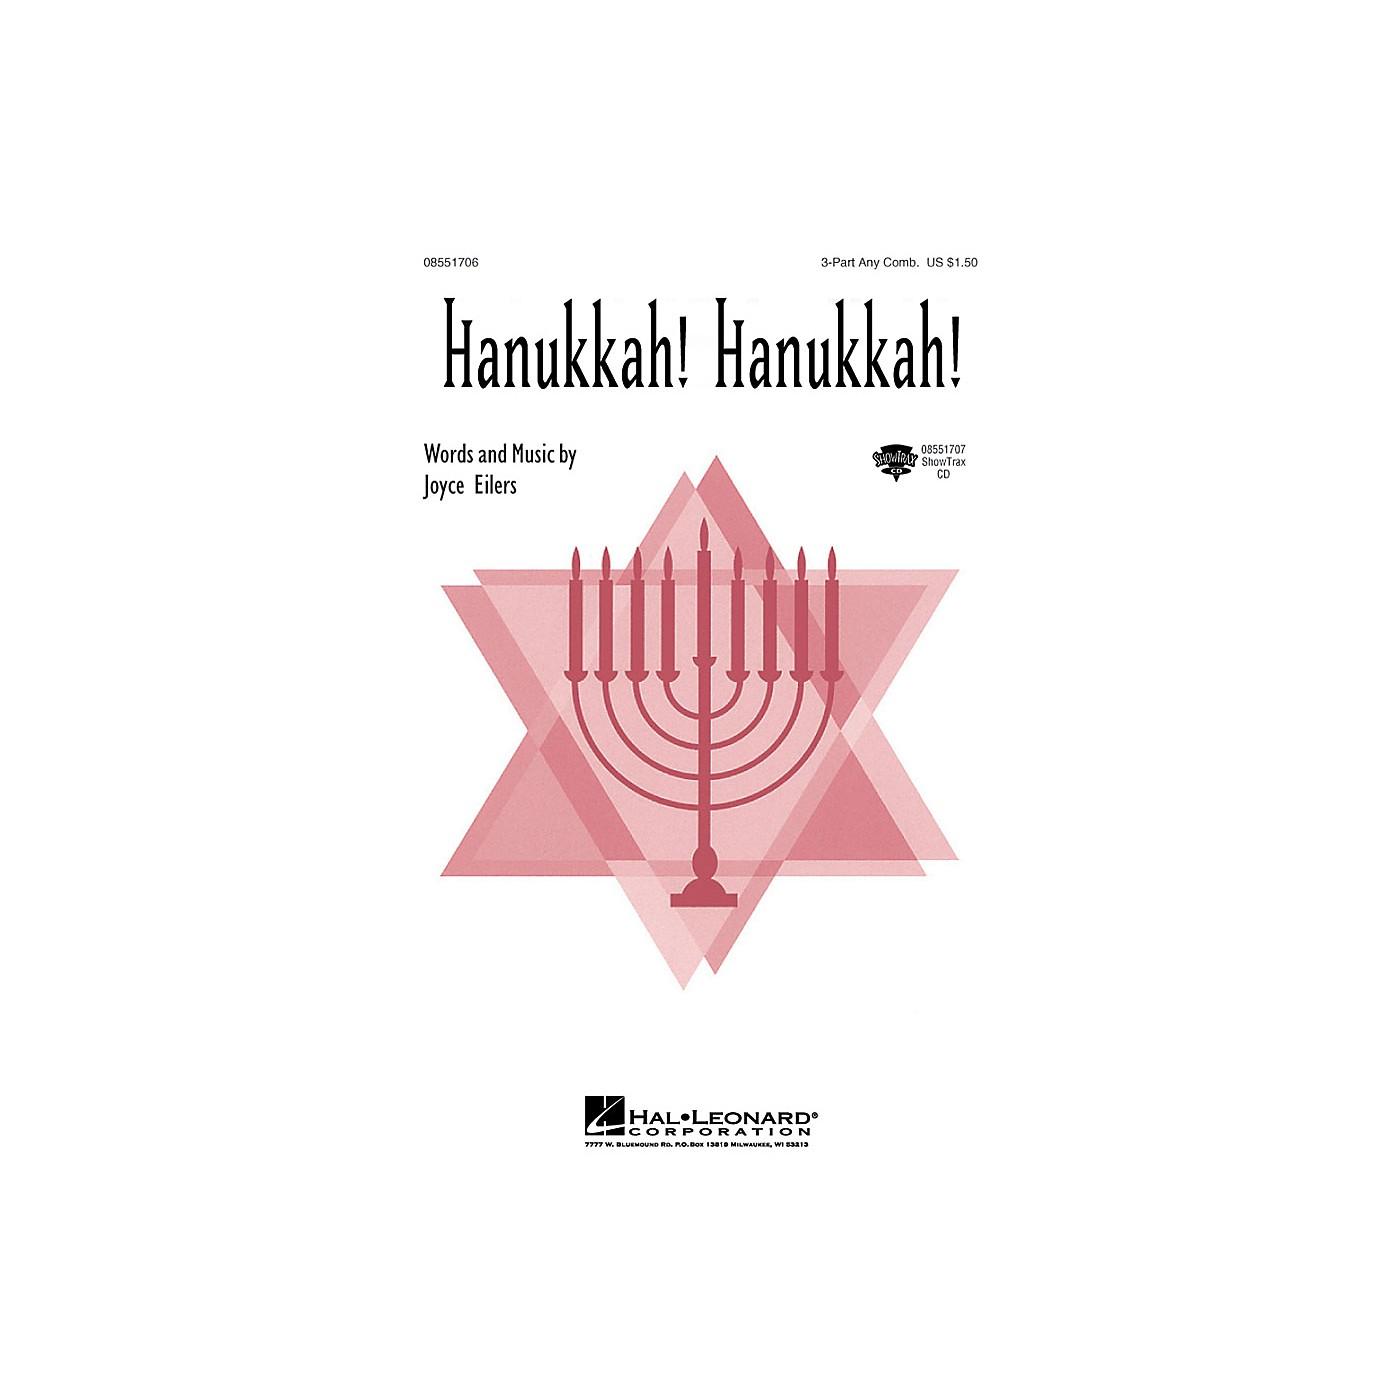 Hal Leonard Hanukkah! Hanukkah! 3 Part Any Combination composed by Joyce Eilers thumbnail